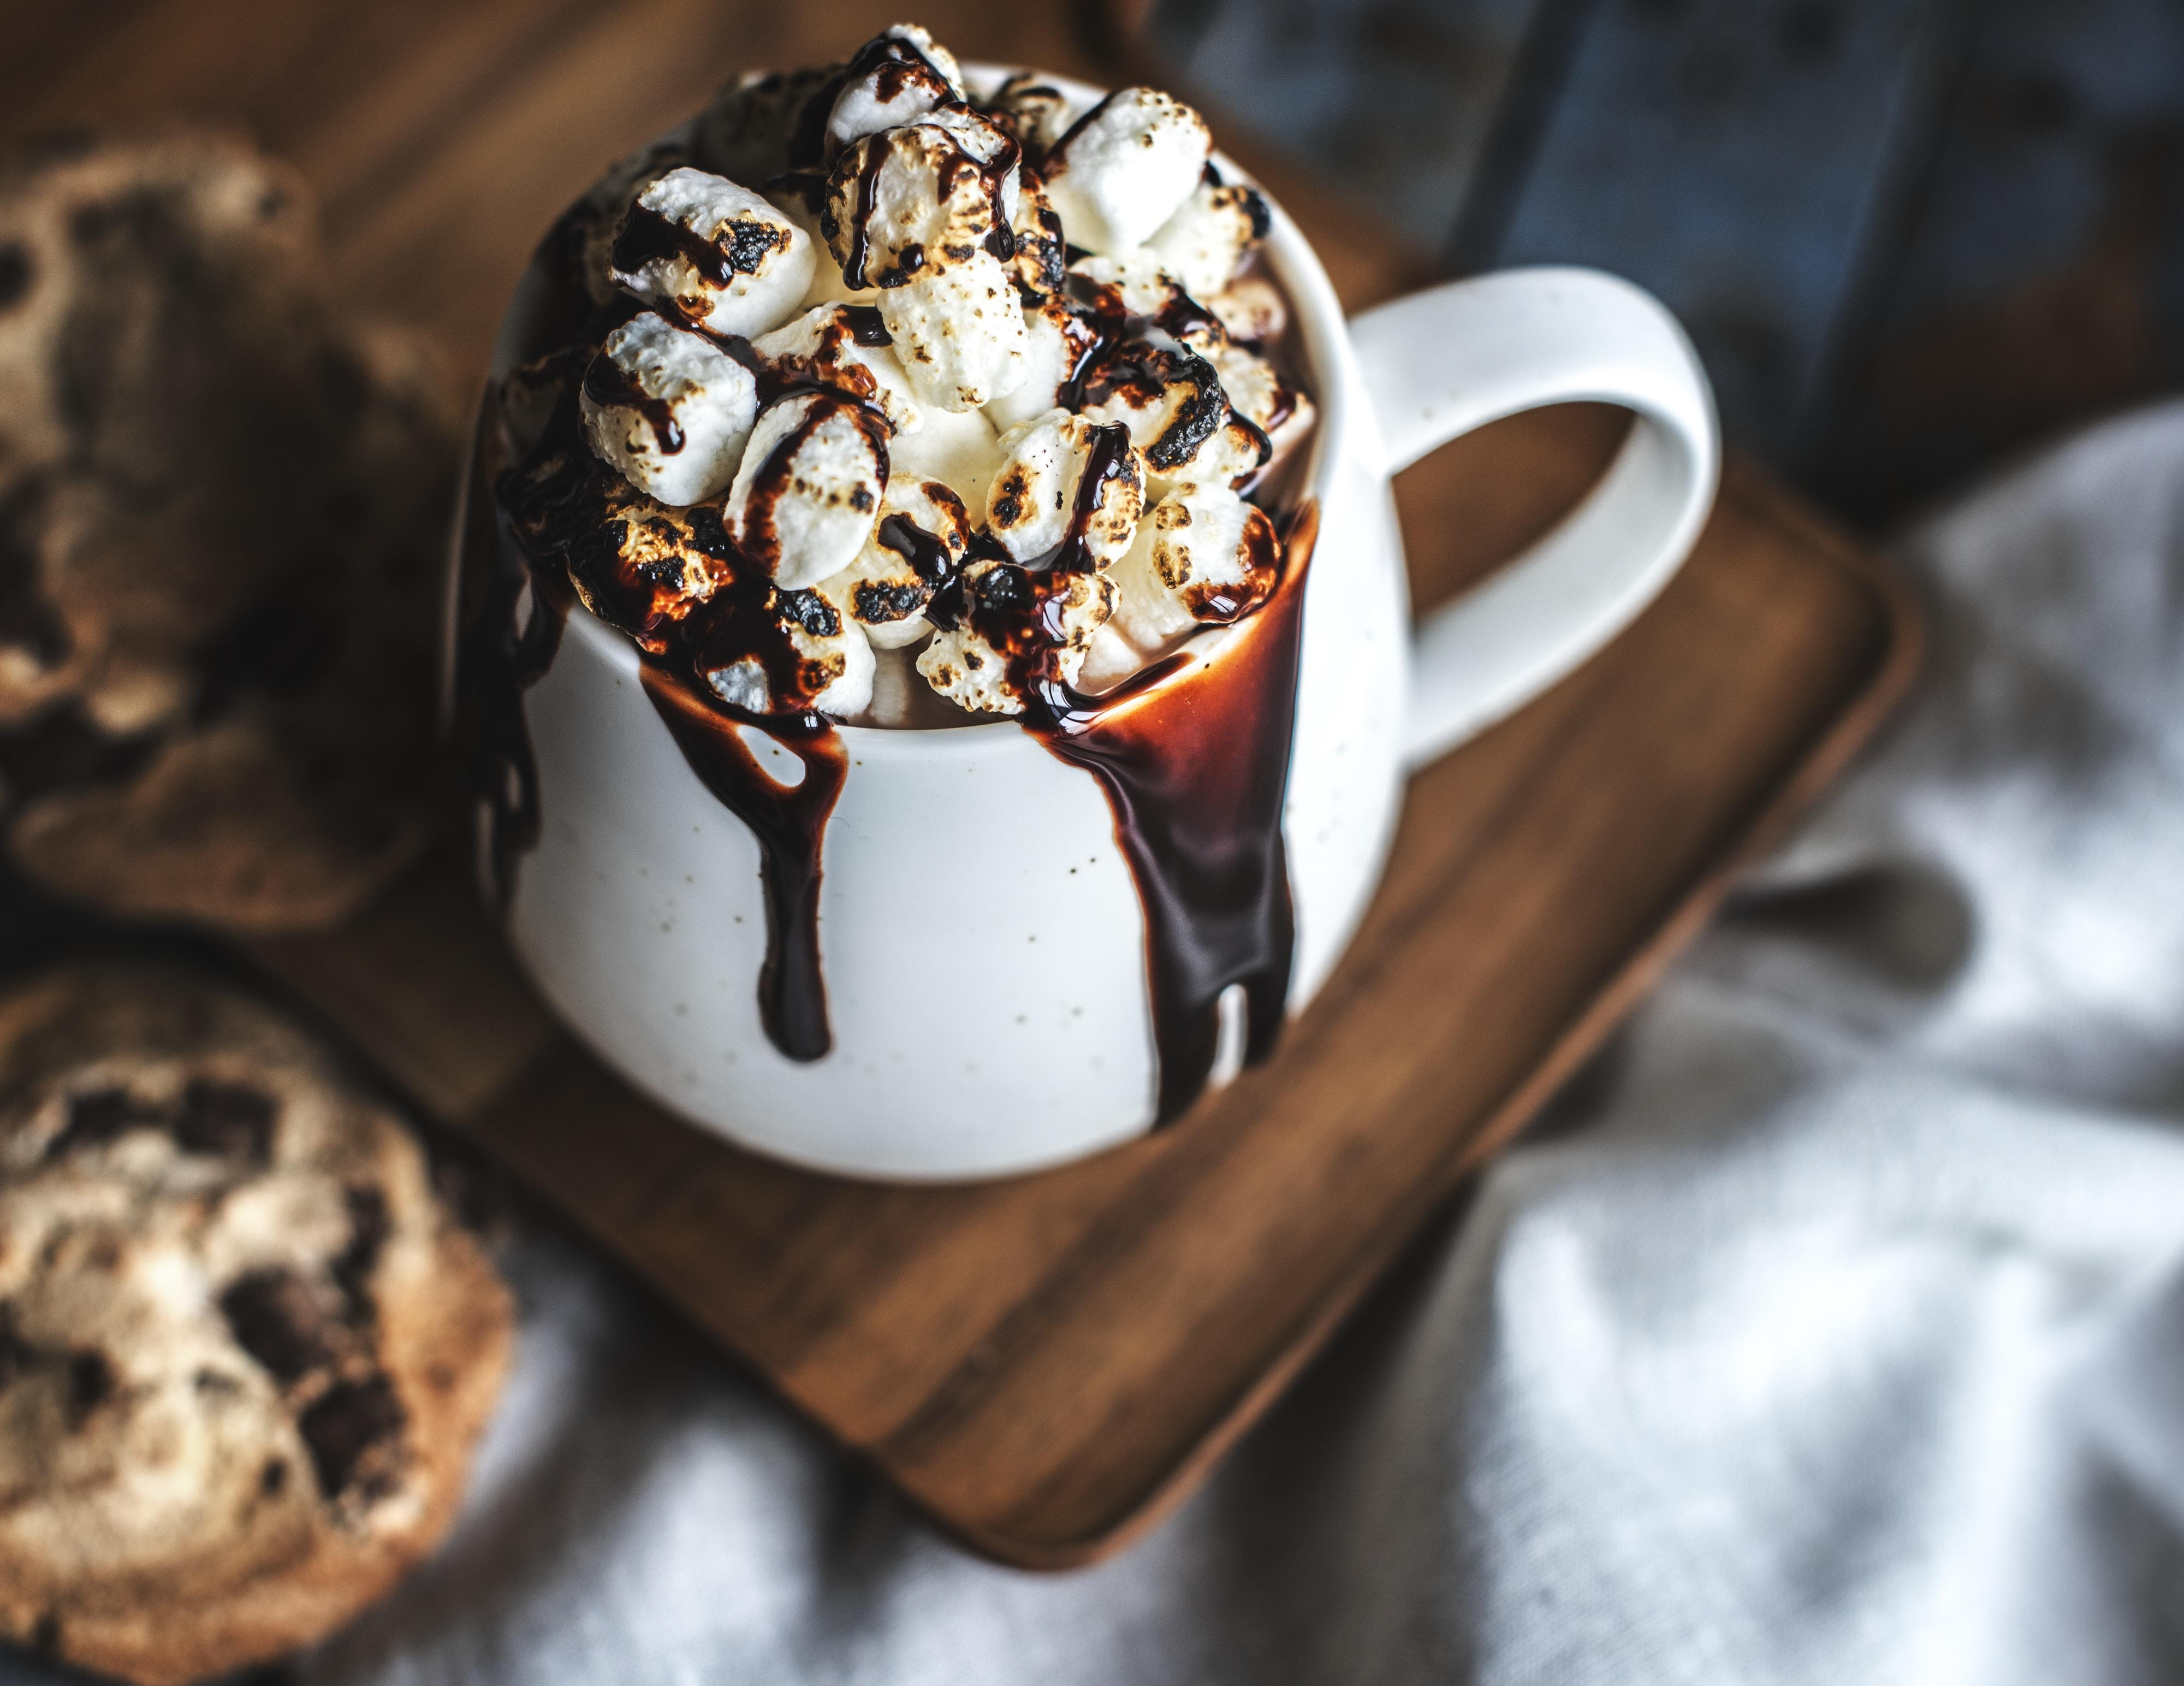 dessert on ceramic cup